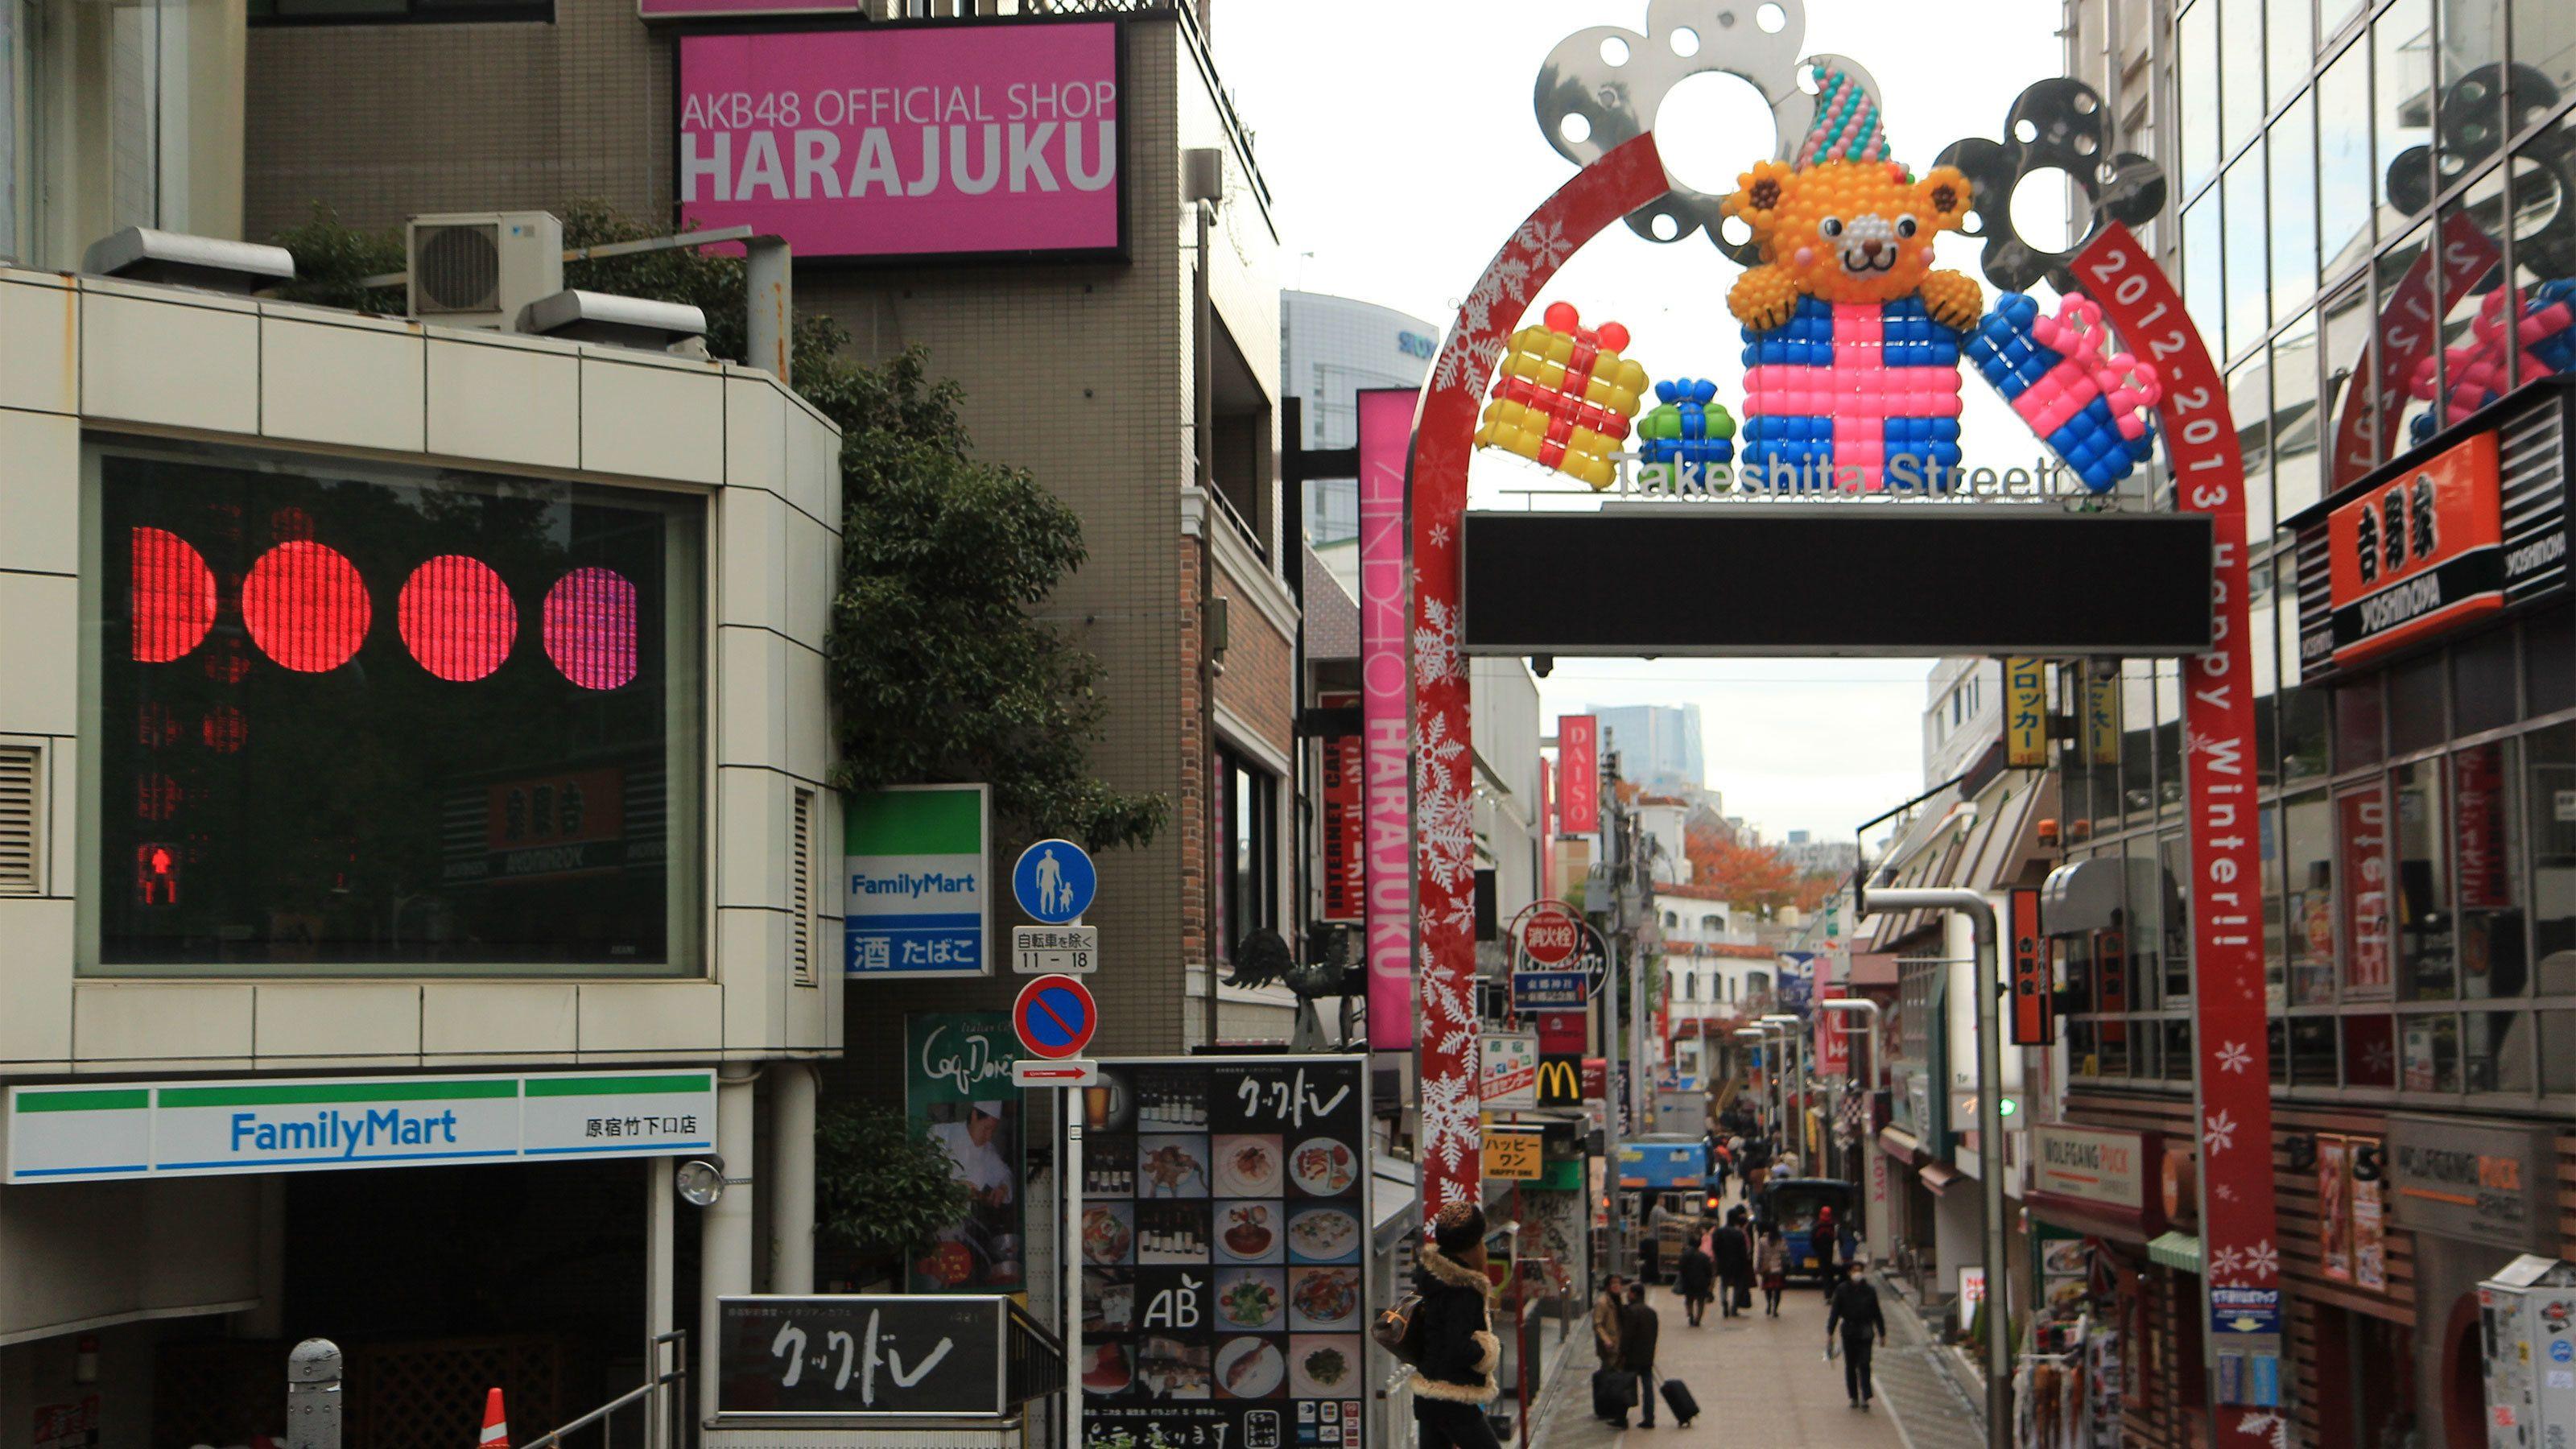 Harajuku in Tokyo